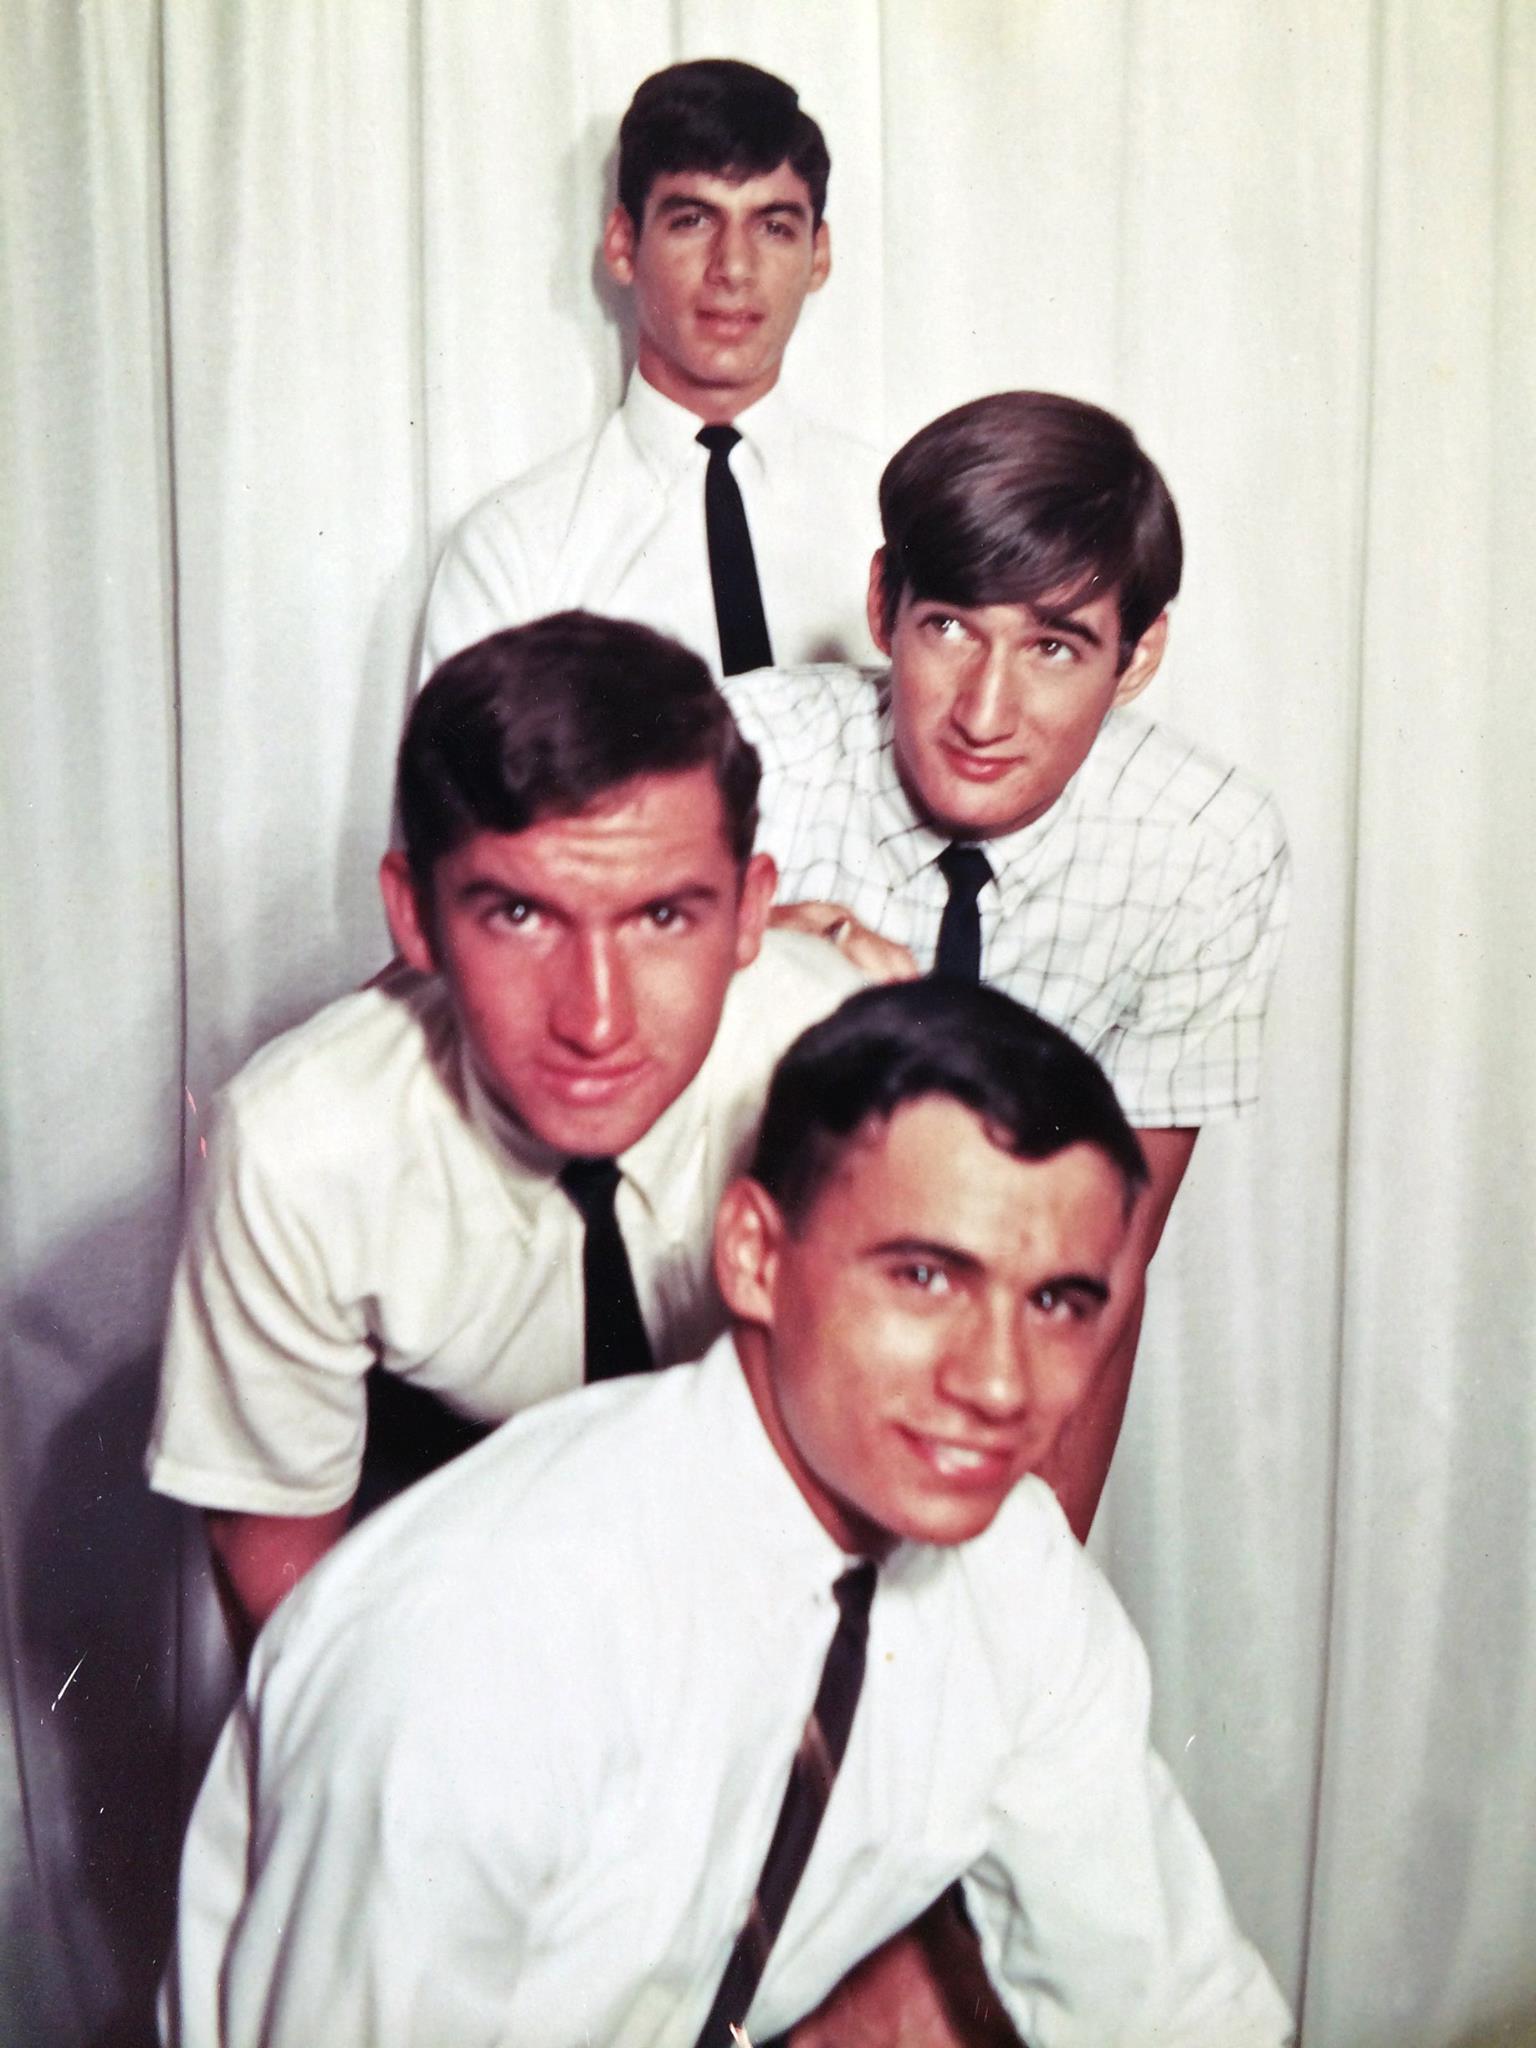 john-carnuccio-papa-nooch-black-and-the-blues-vintage-music-band-photo